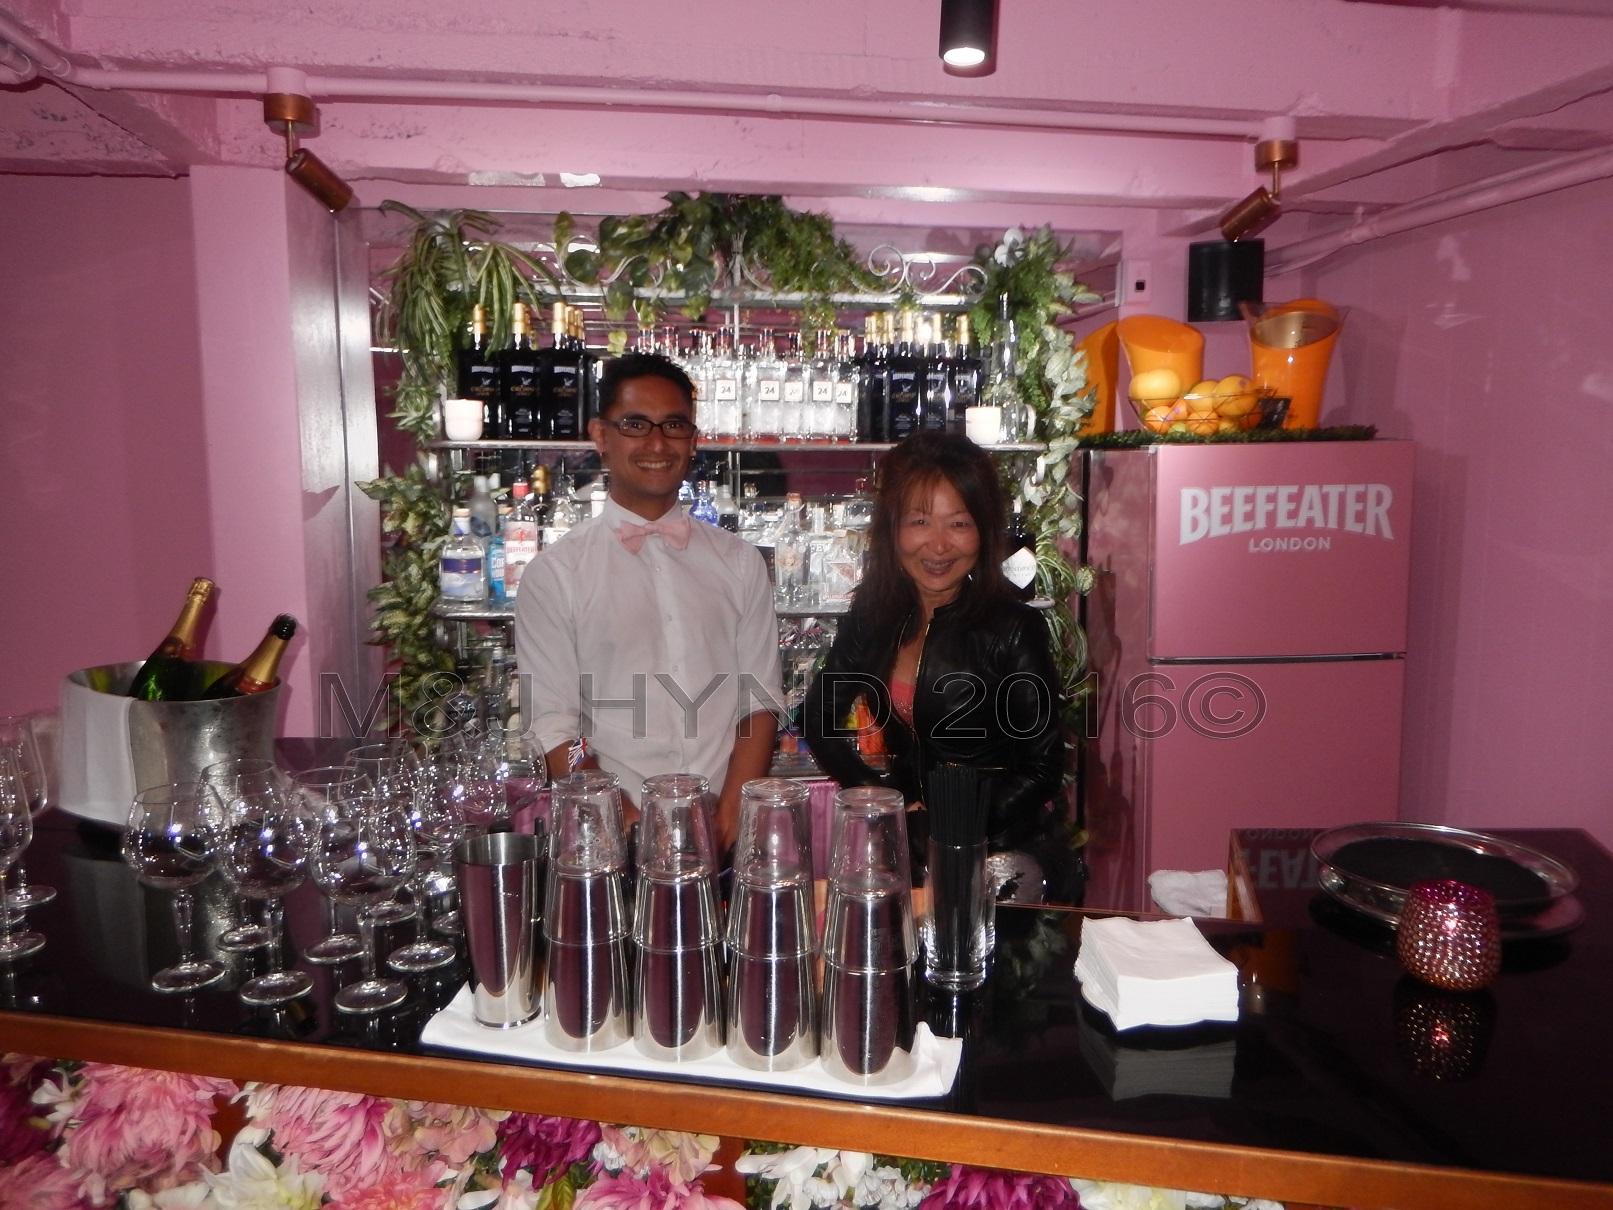 floral bar, Britomart area, Auckland, NZ